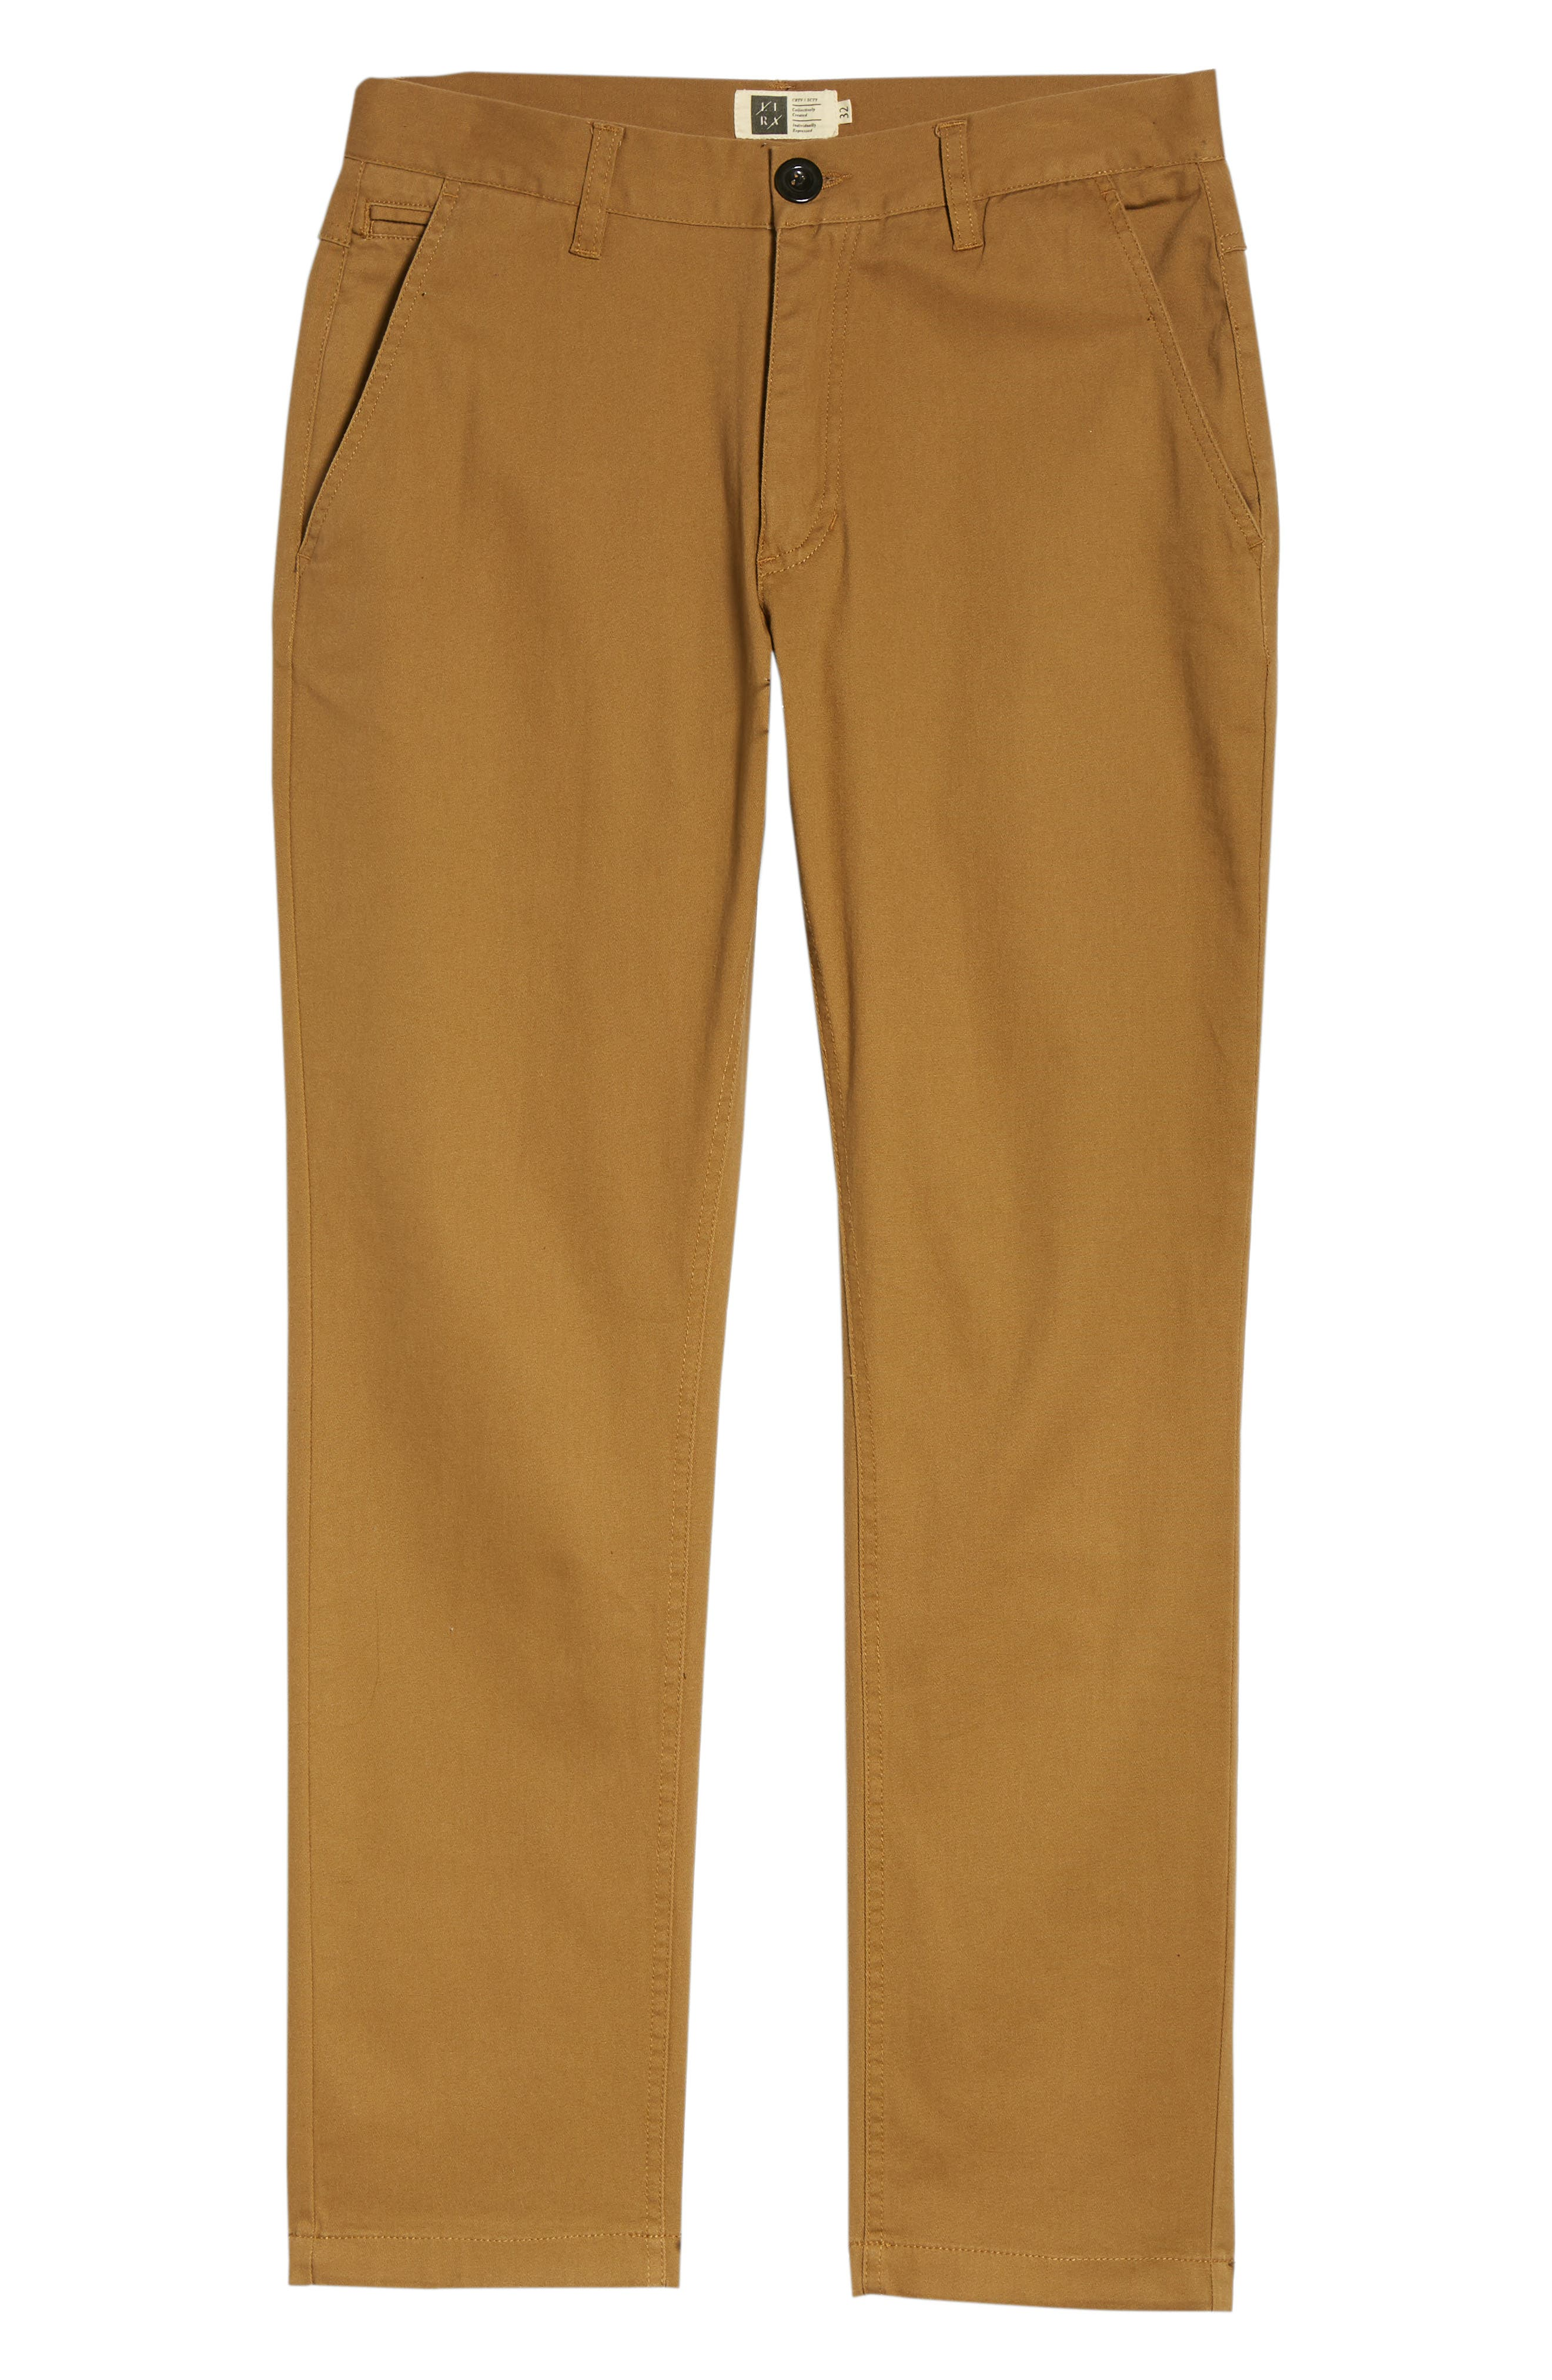 Crossroad Slim Fit Pants,                             Alternate thumbnail 6, color,                             Khaki